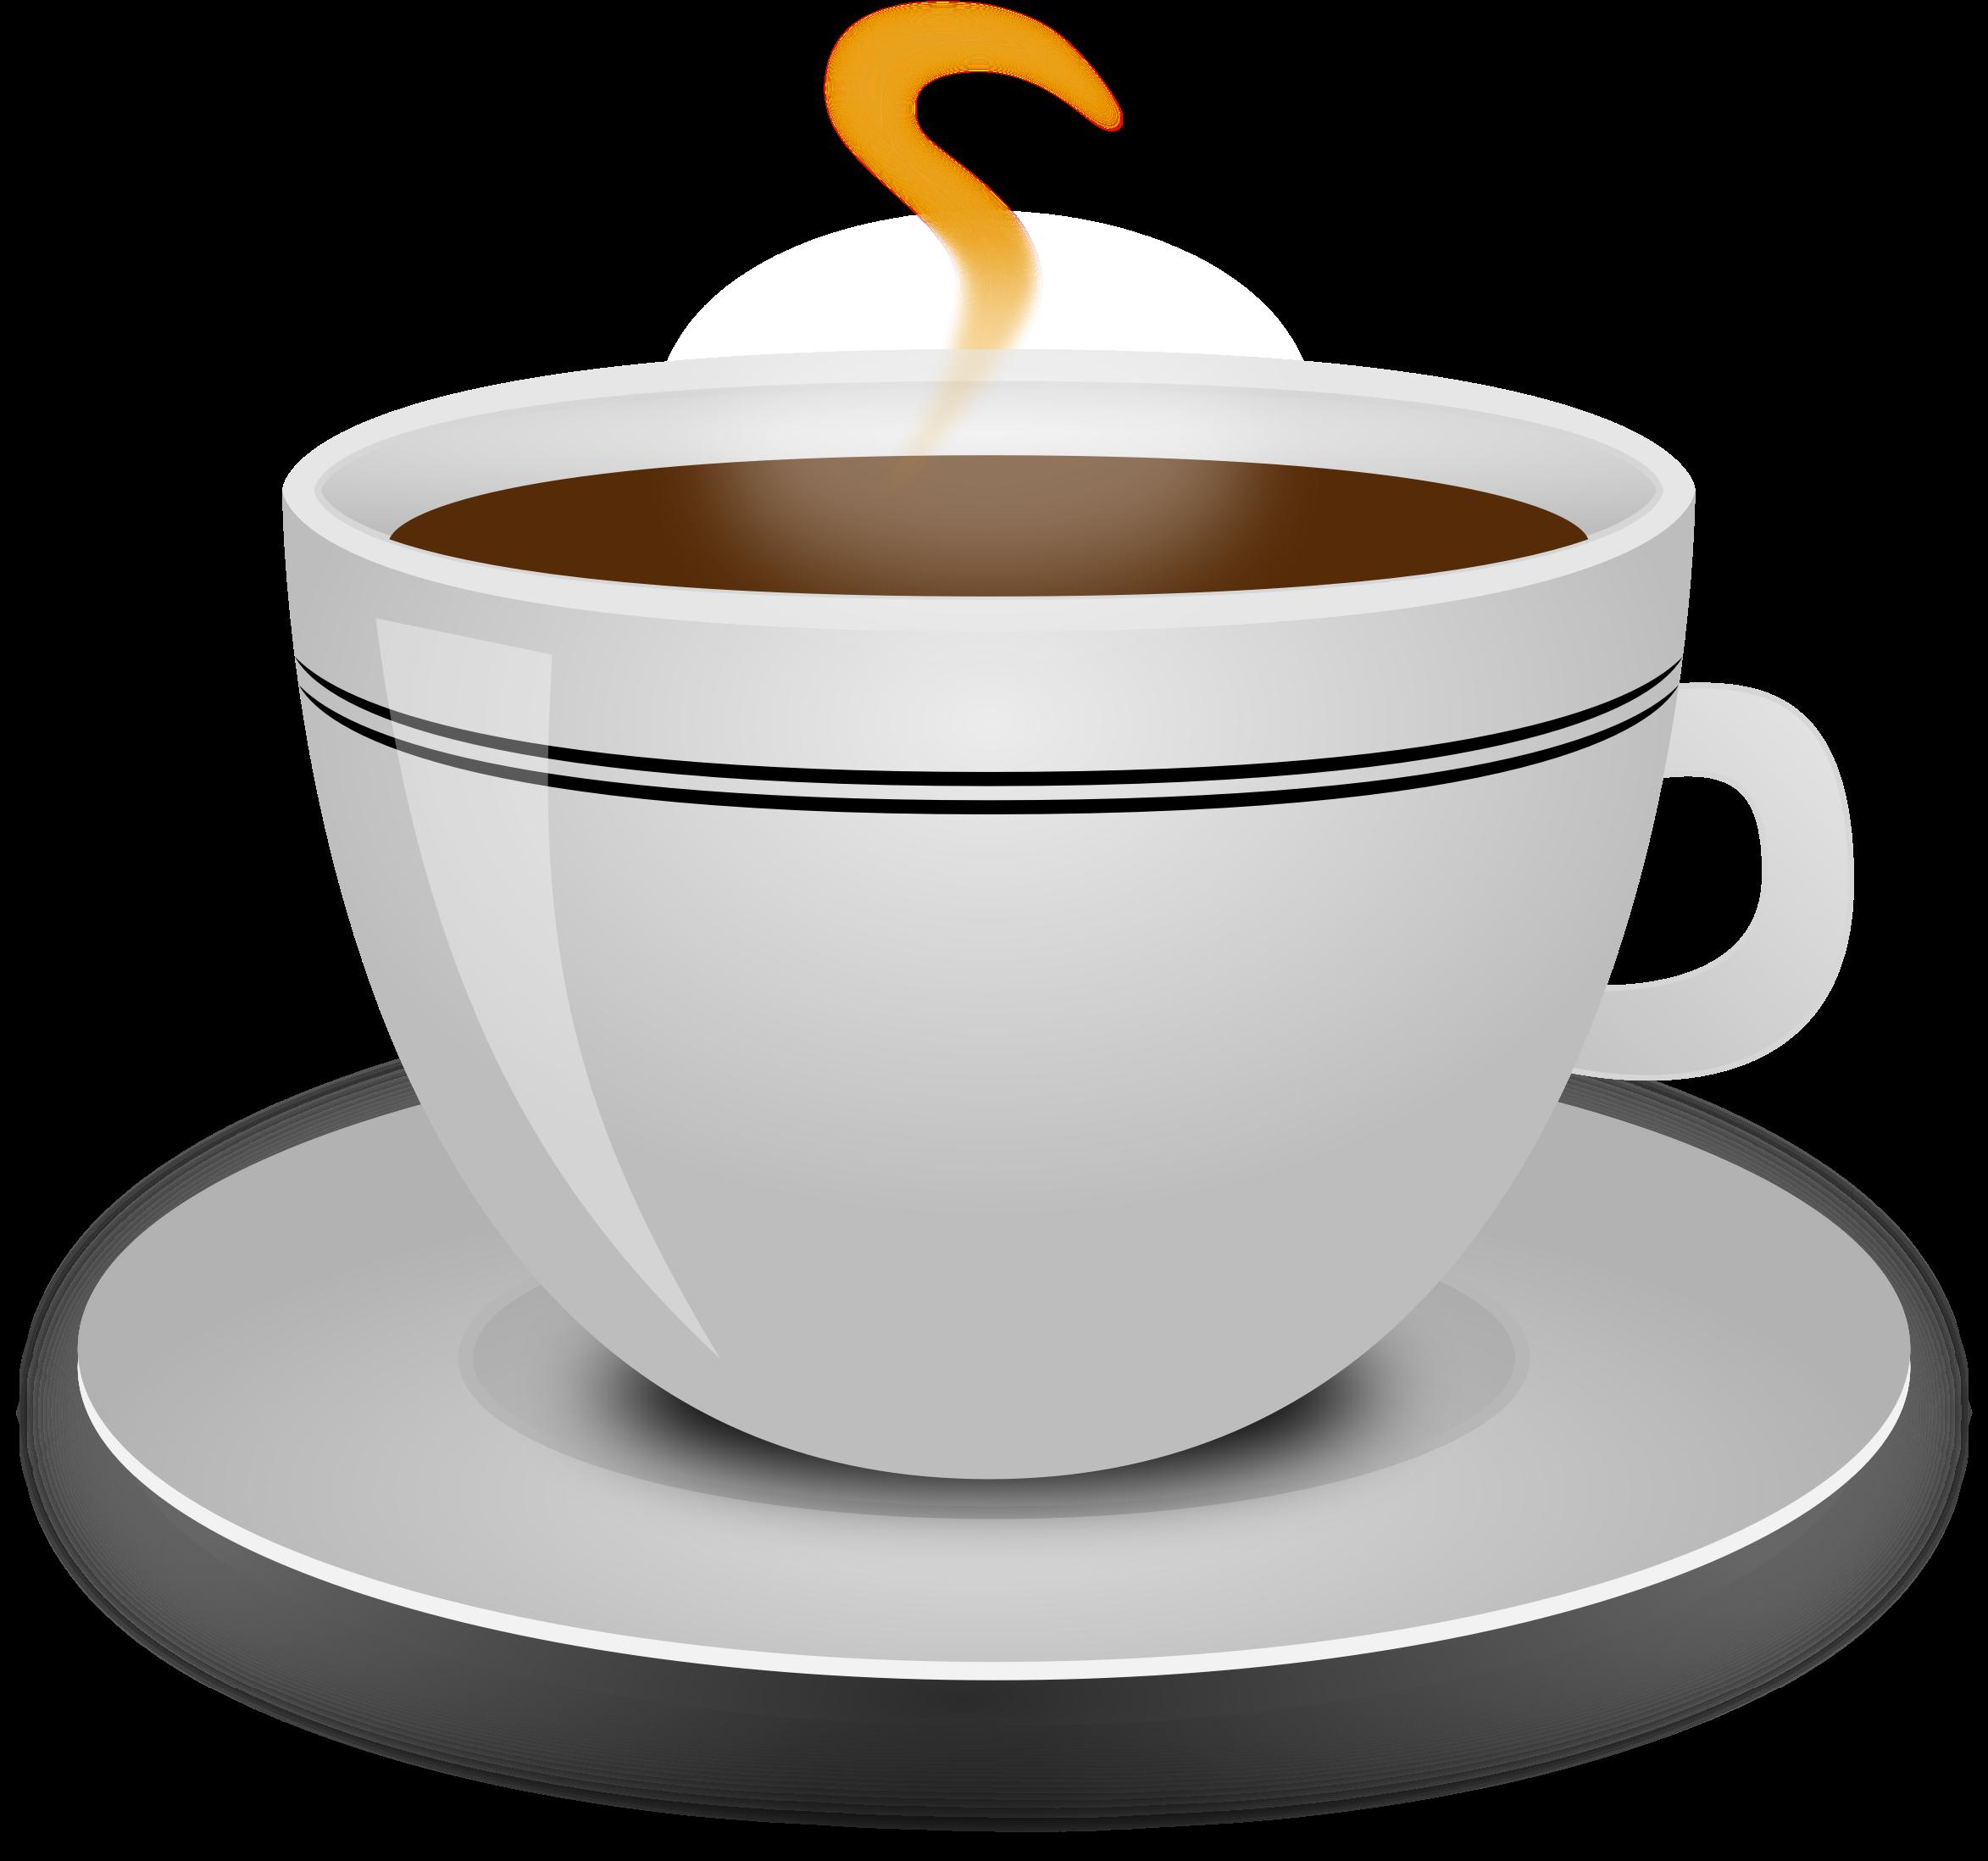 coffee clipart Bing images Coffee alternative, Coffee